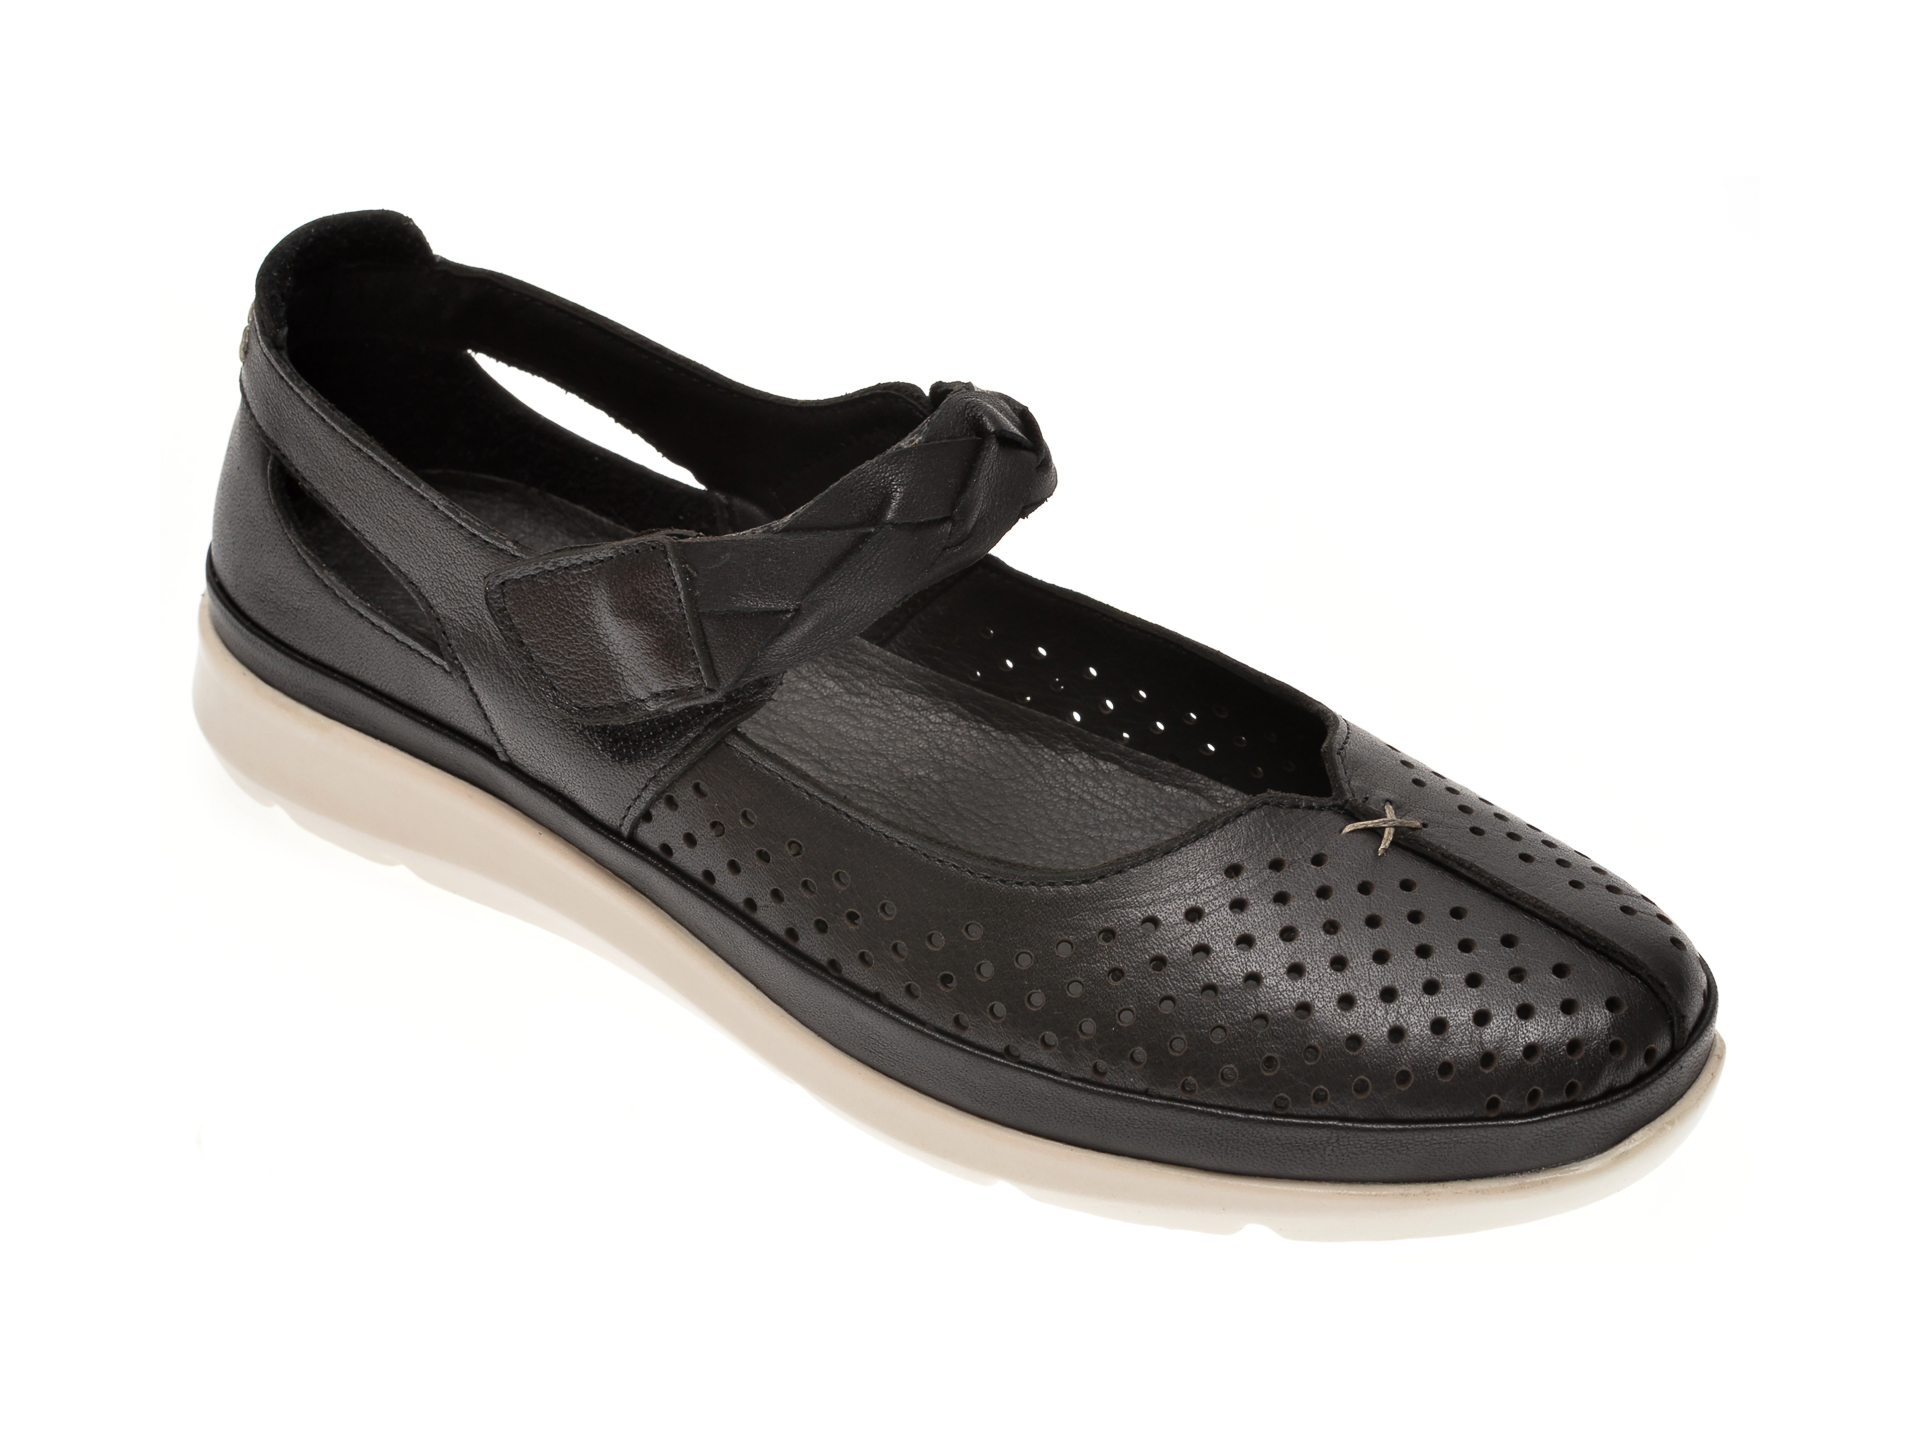 Pantofi X TREND negri, 608, din piele naturala